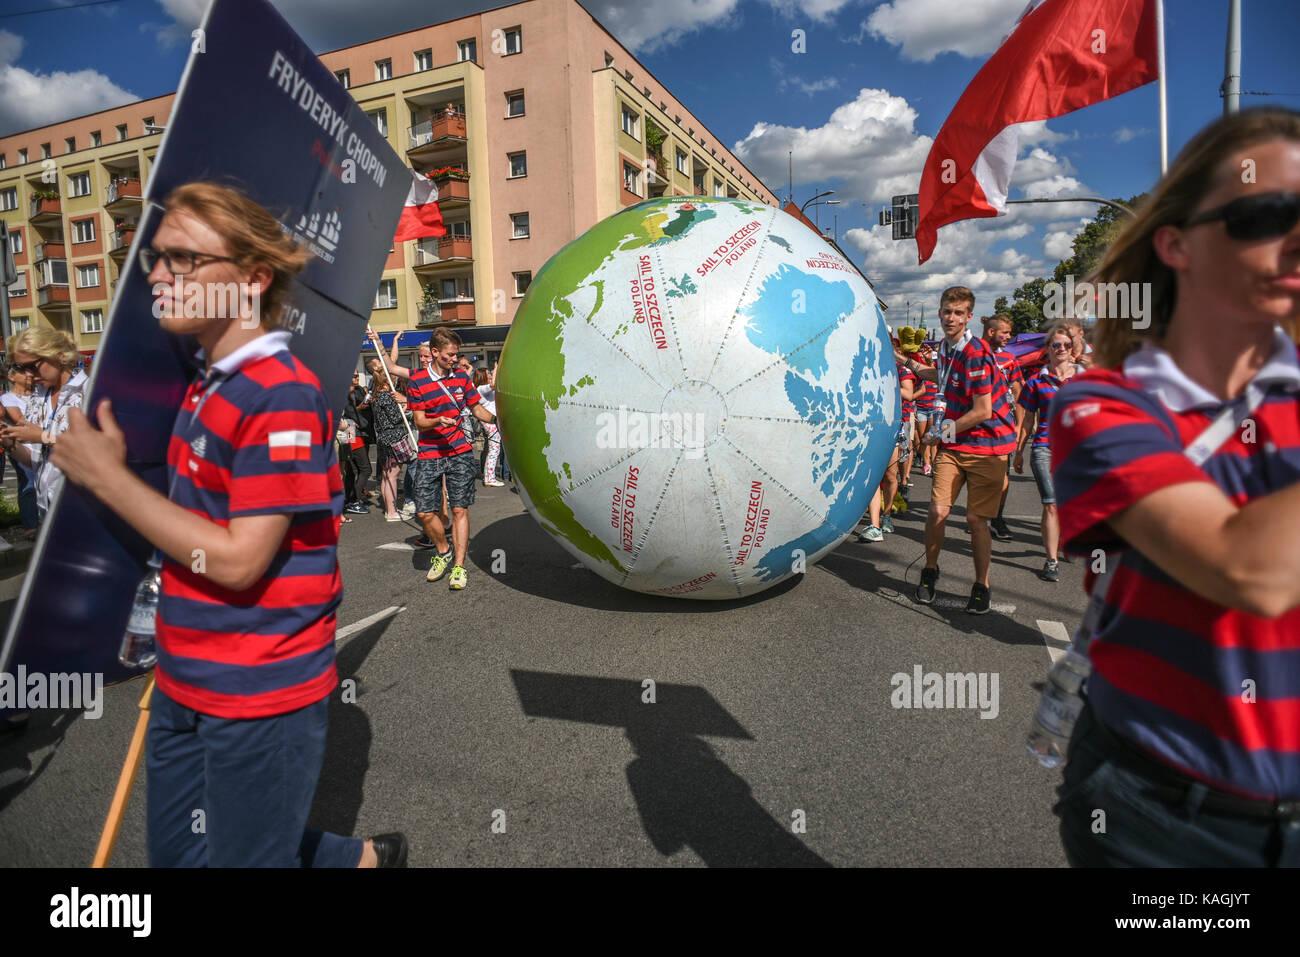 Szczecin, Poland, 6 august 2017: The Tall Ships Races 2017 crew parade in Szczecin, Fryderyk Chopin. - Stock Image